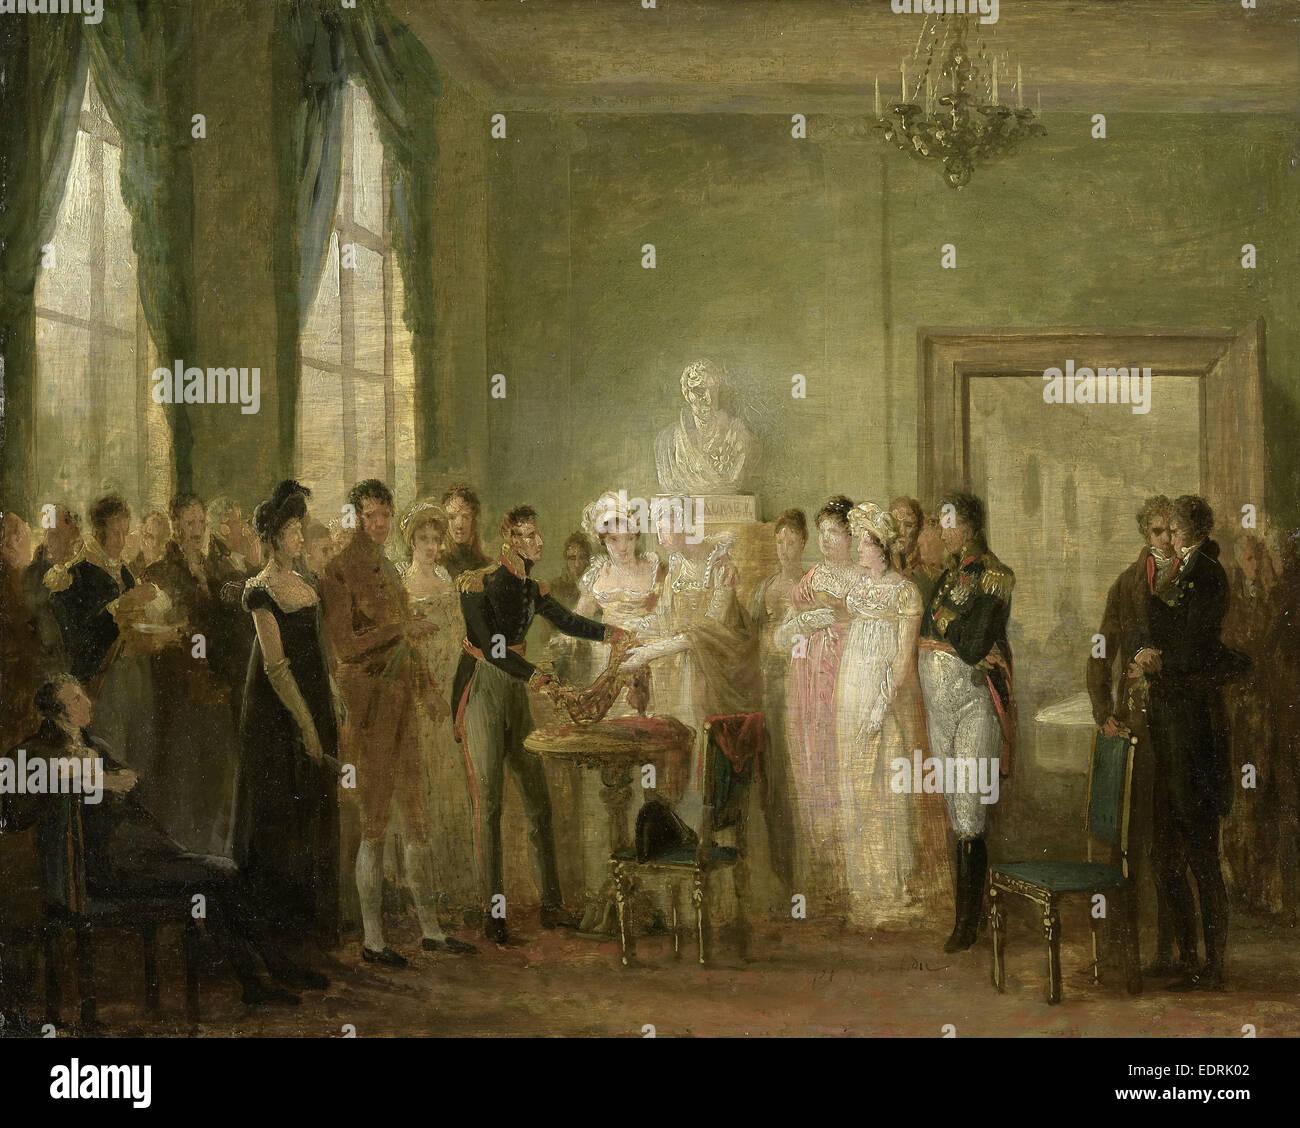 Unidentified historical performance, Mattheus Ignatius van Bree, 1815 - 1830 - Stock Image